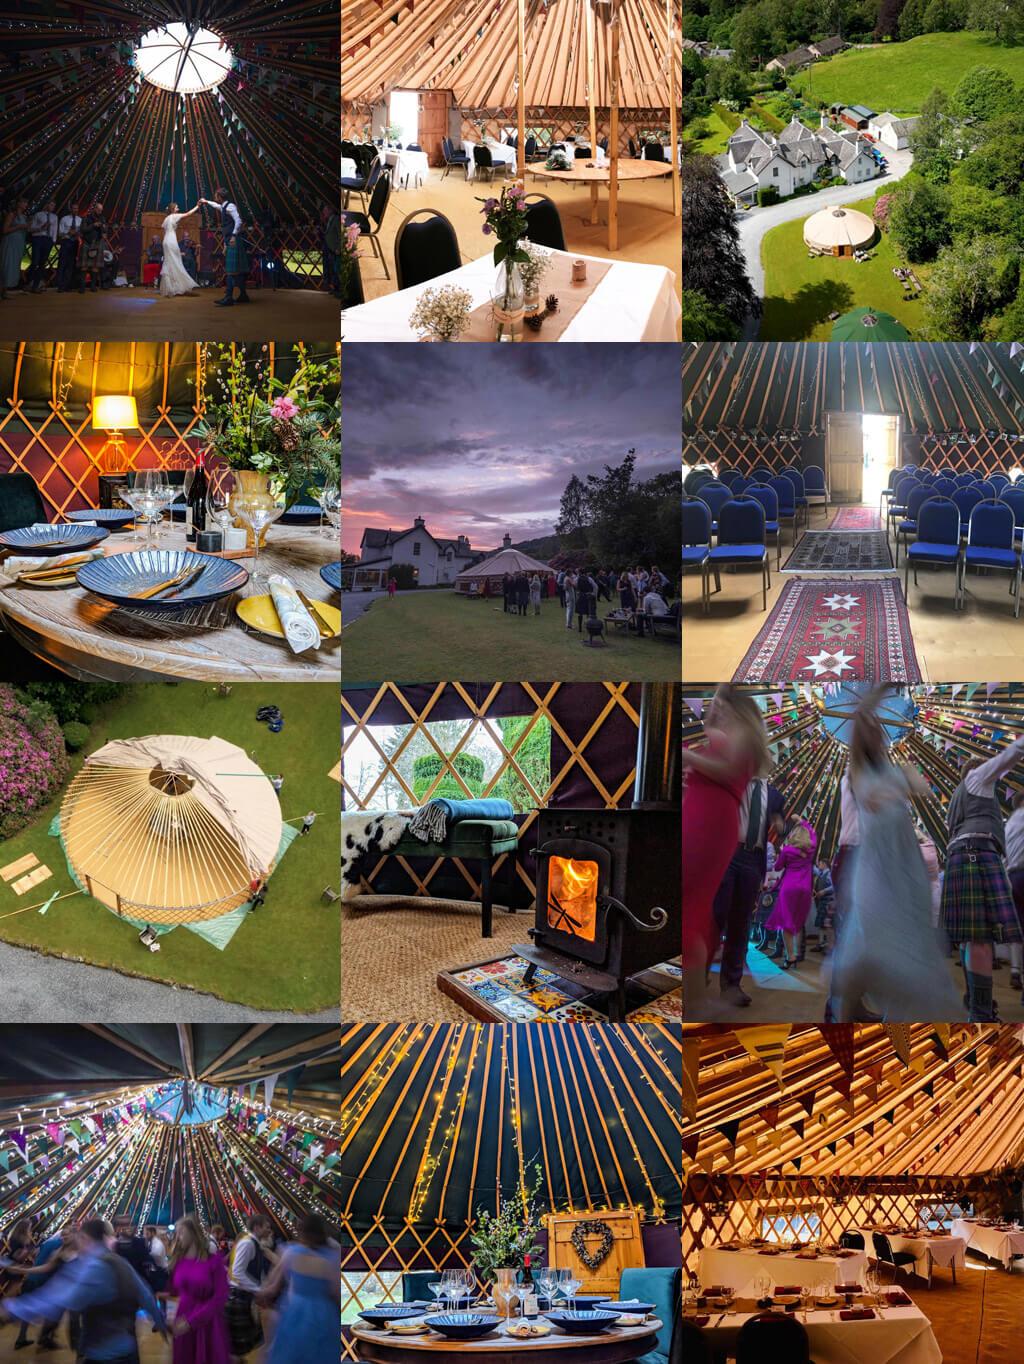 Handcrafted Bespoke Wedding Venue Dragonfly Yurts